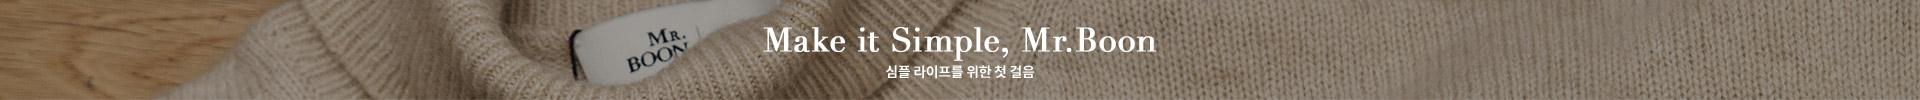 Make It Simple, Mr.Boon